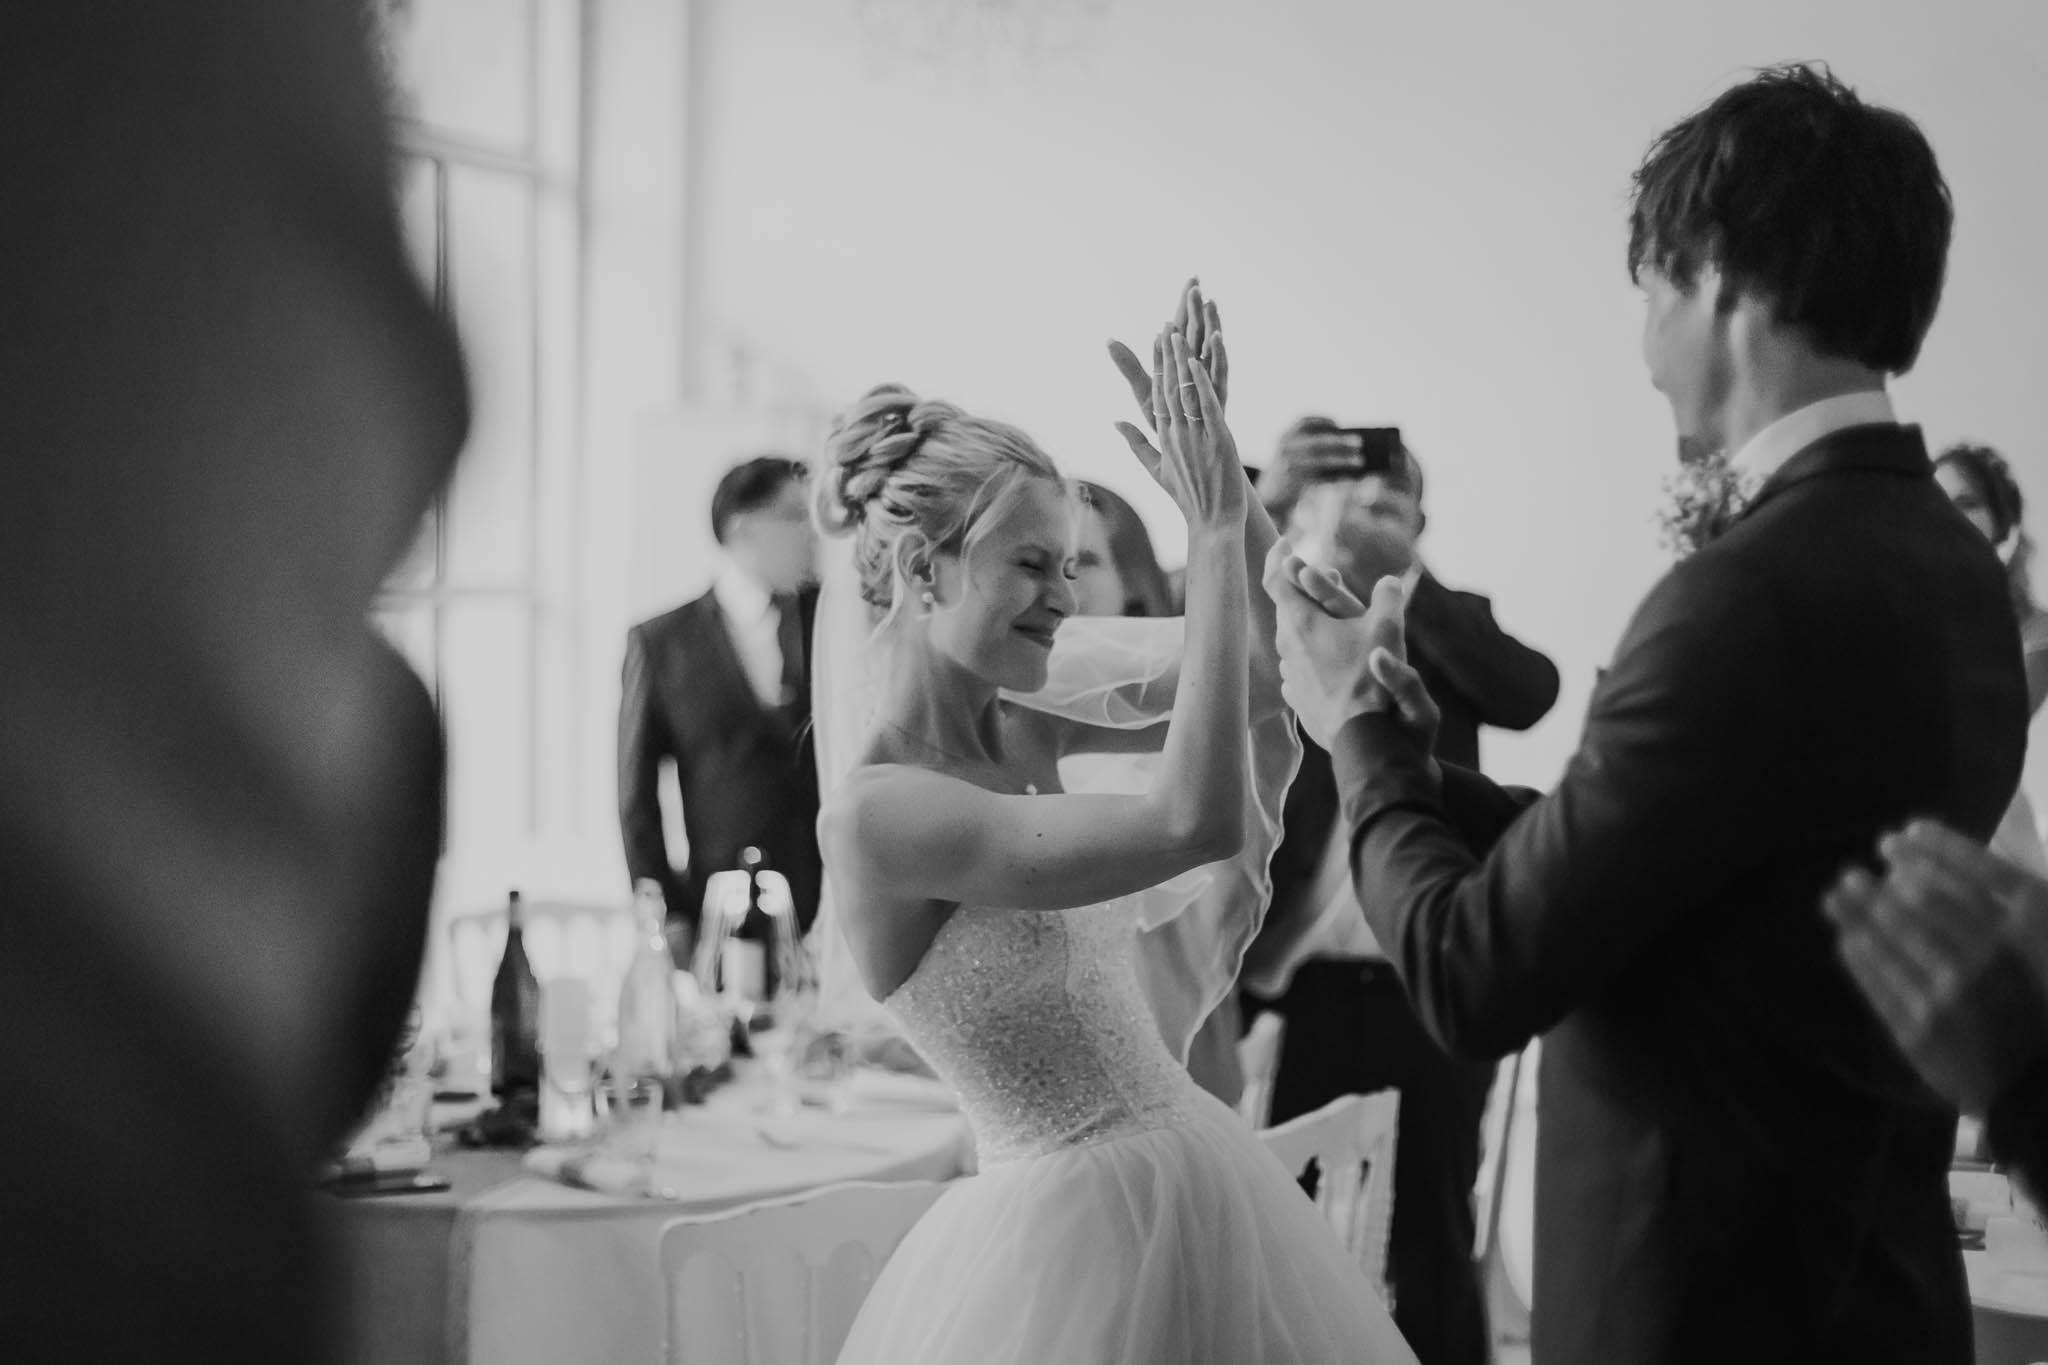 mariage-chateau-gaudras-ingold-96.jpg